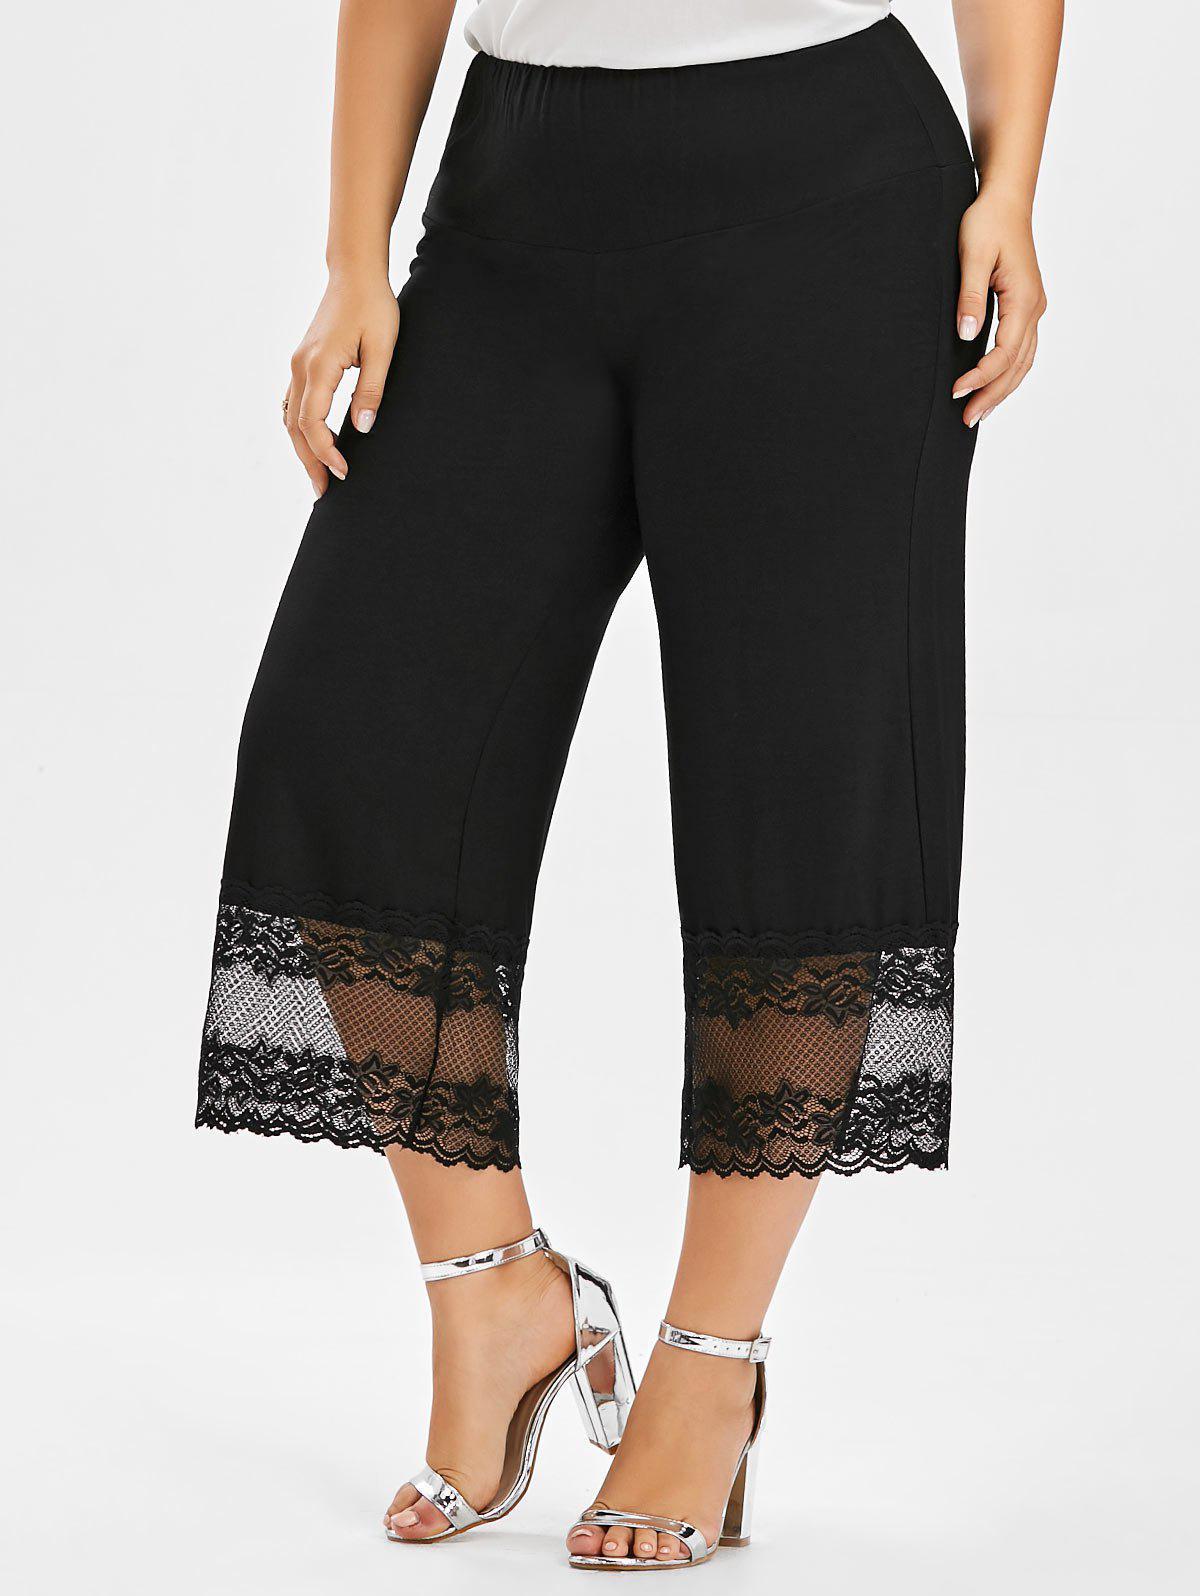 Lace Trim Palazzo Plus Size Pants 212129801